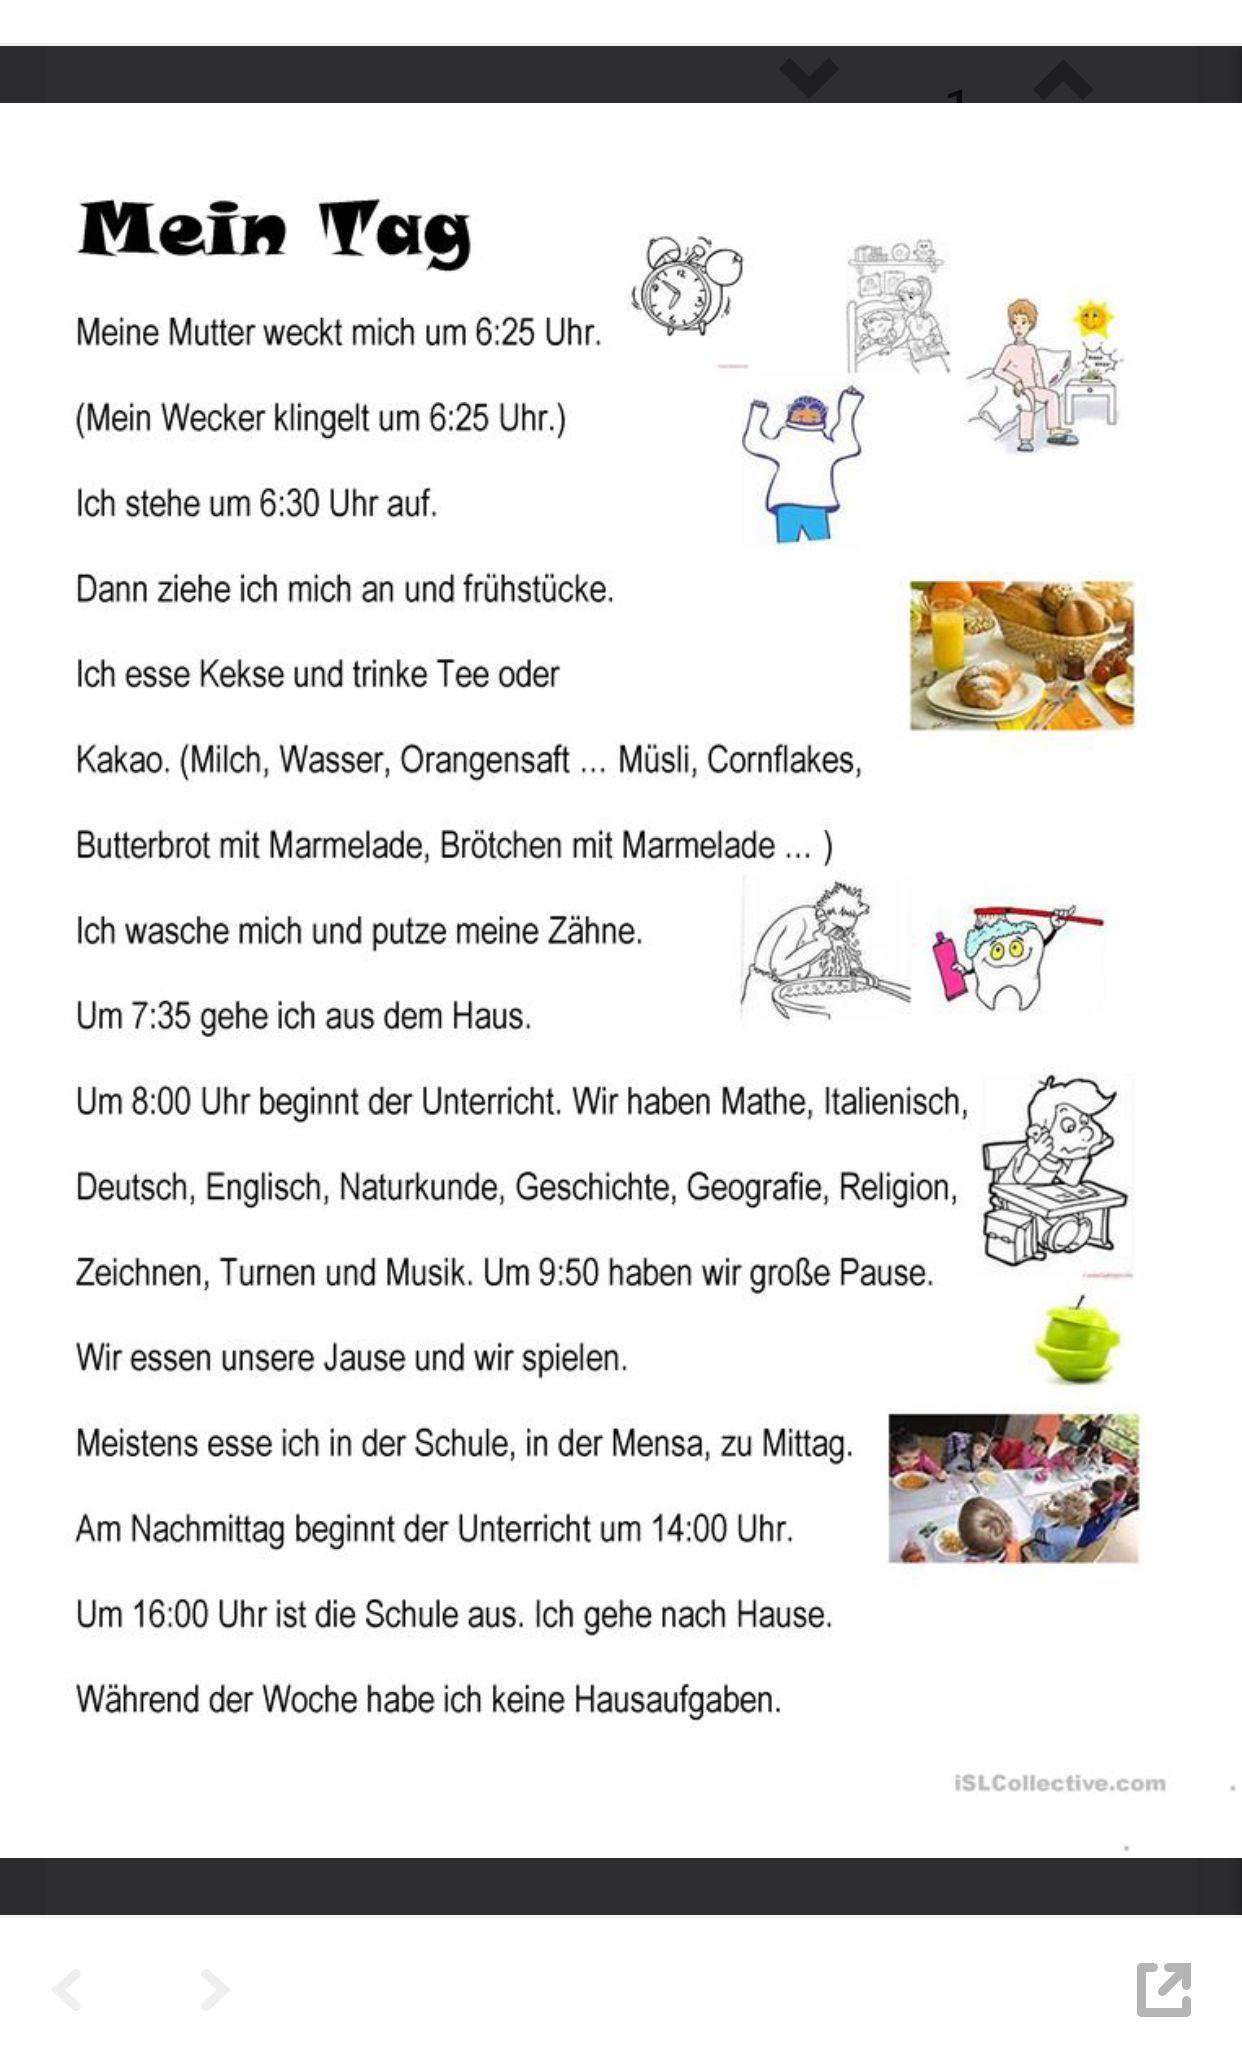 Mein Tag | német | Pinterest | Learn german, Language and German ...